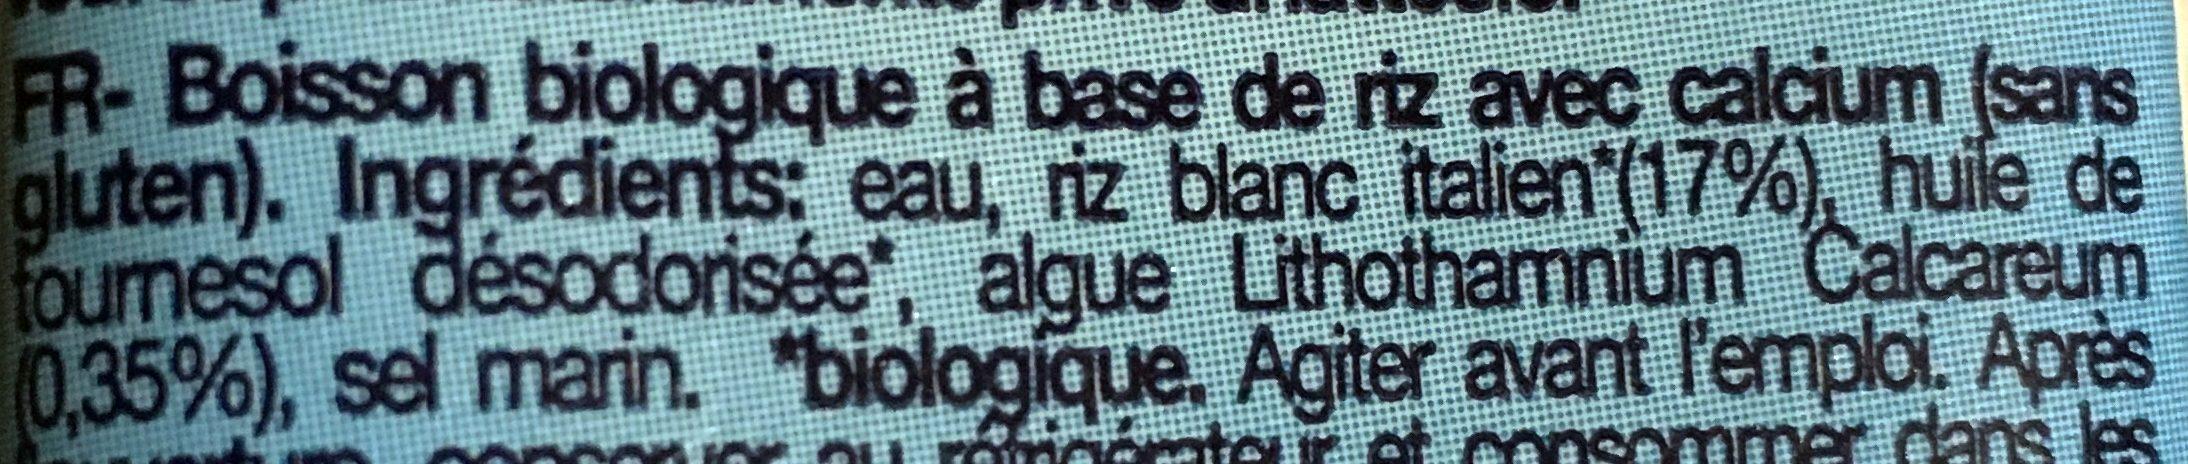 Boisson Riz Calcium - Ingrédients - fr